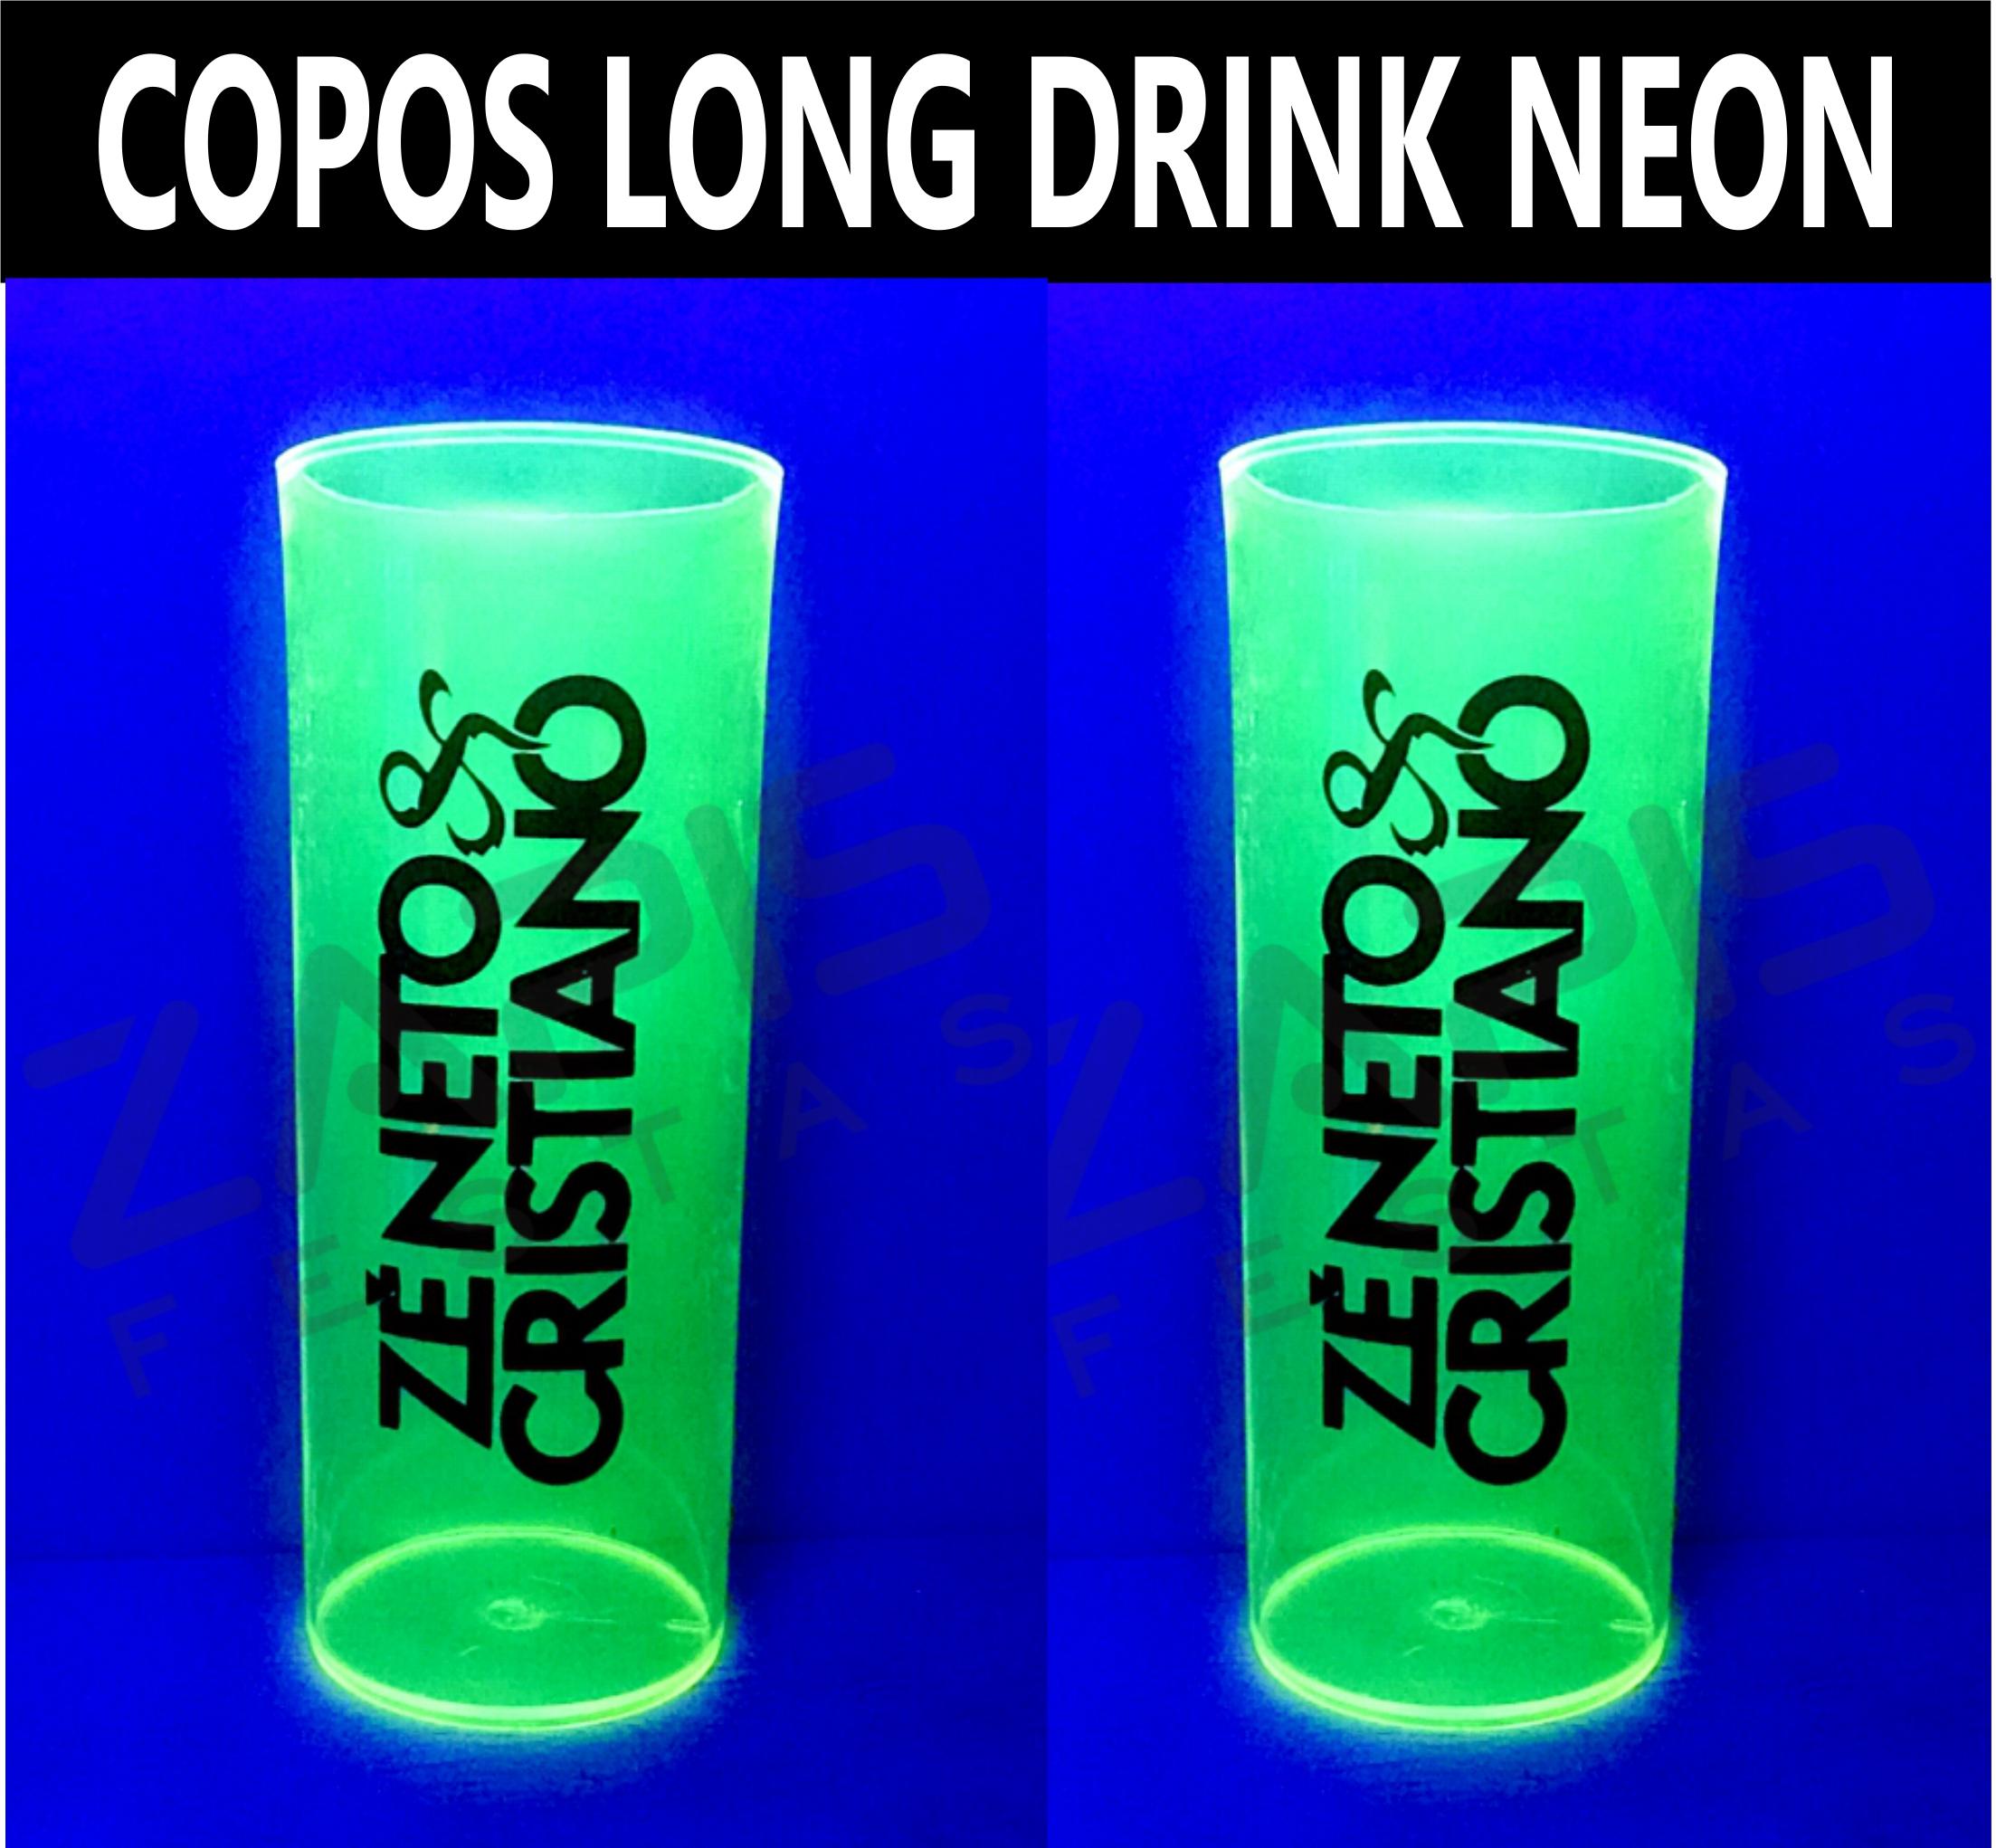 3f0844a2e 115 Copos Long Drink Neon Personalizado no Elo7